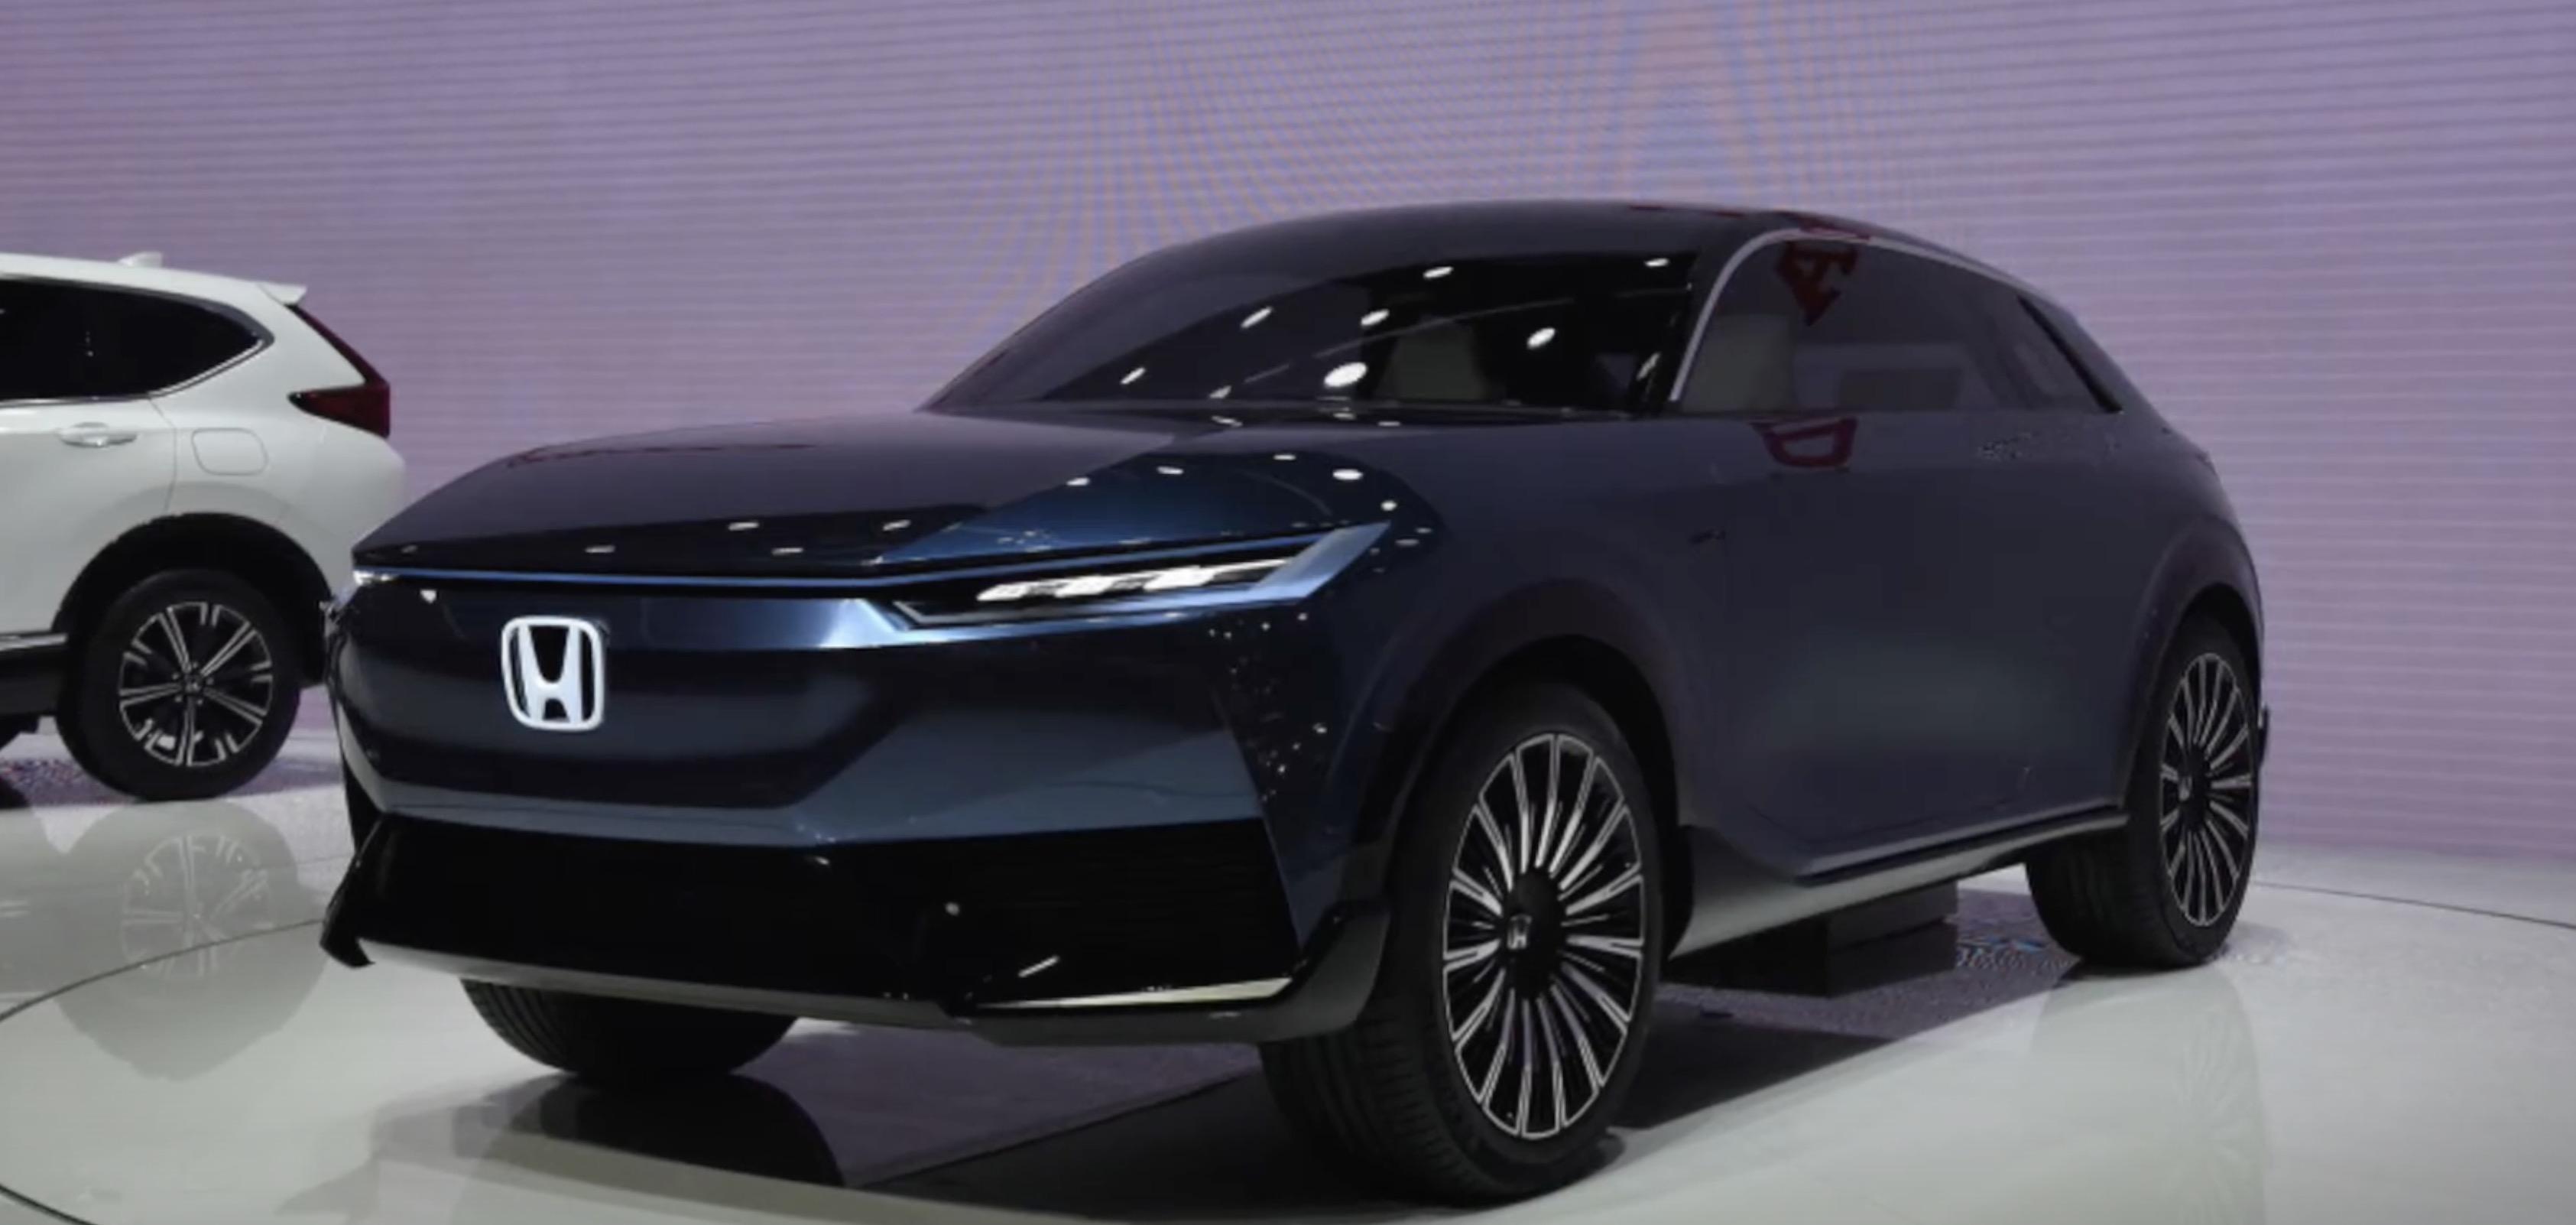 Honda Unveils Sleek New Electric Suv Concept Showing Future Mass Production Model Trend Electrek